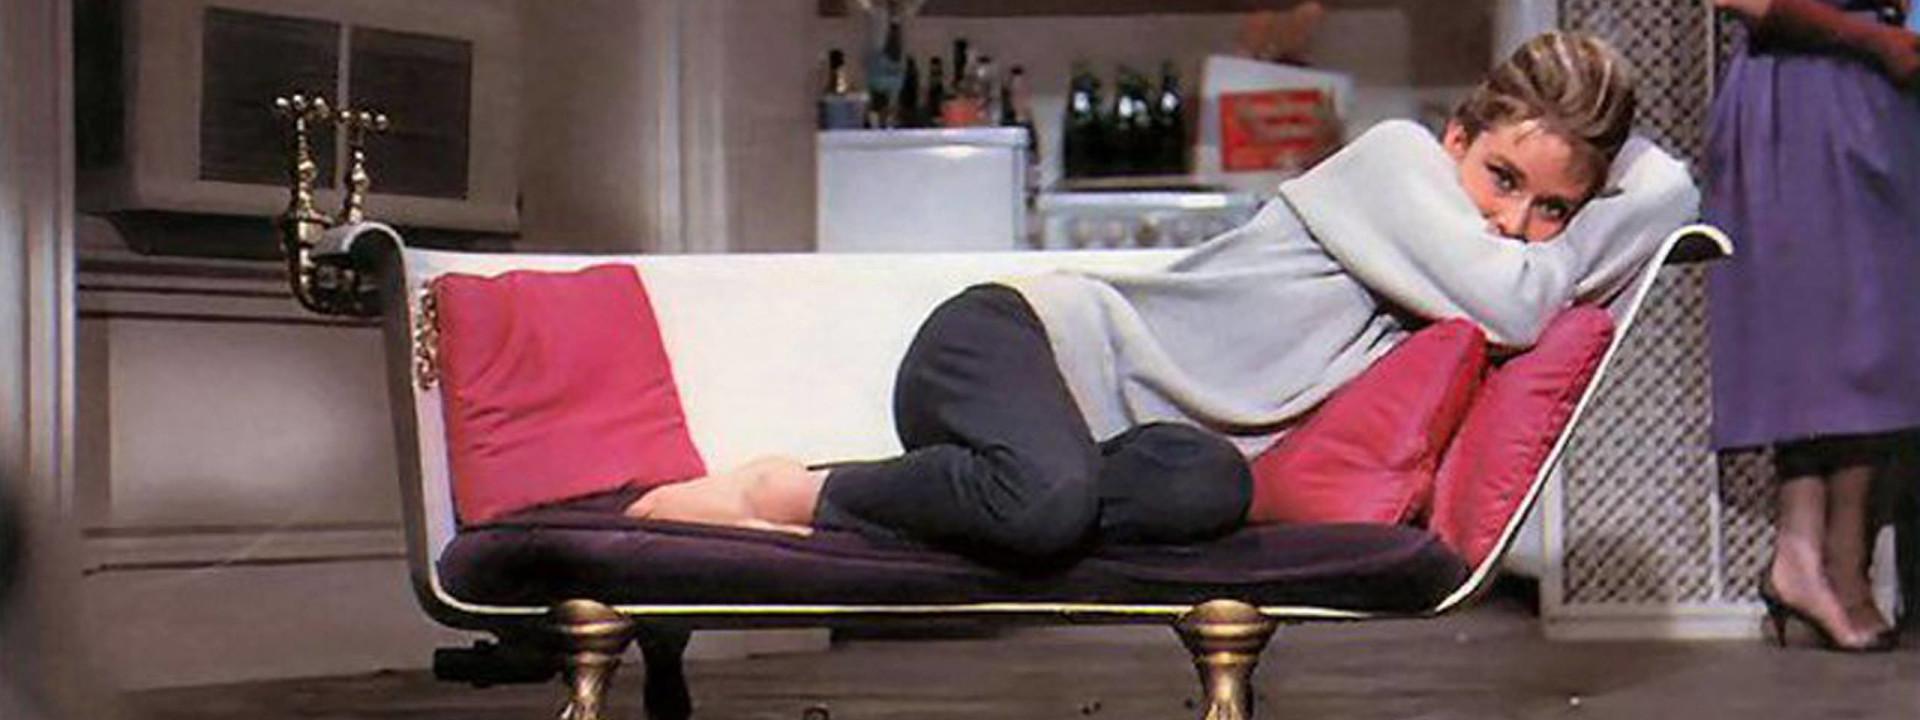 Tub Sofa Breakfast at Tiffanys Audrey Hepburn